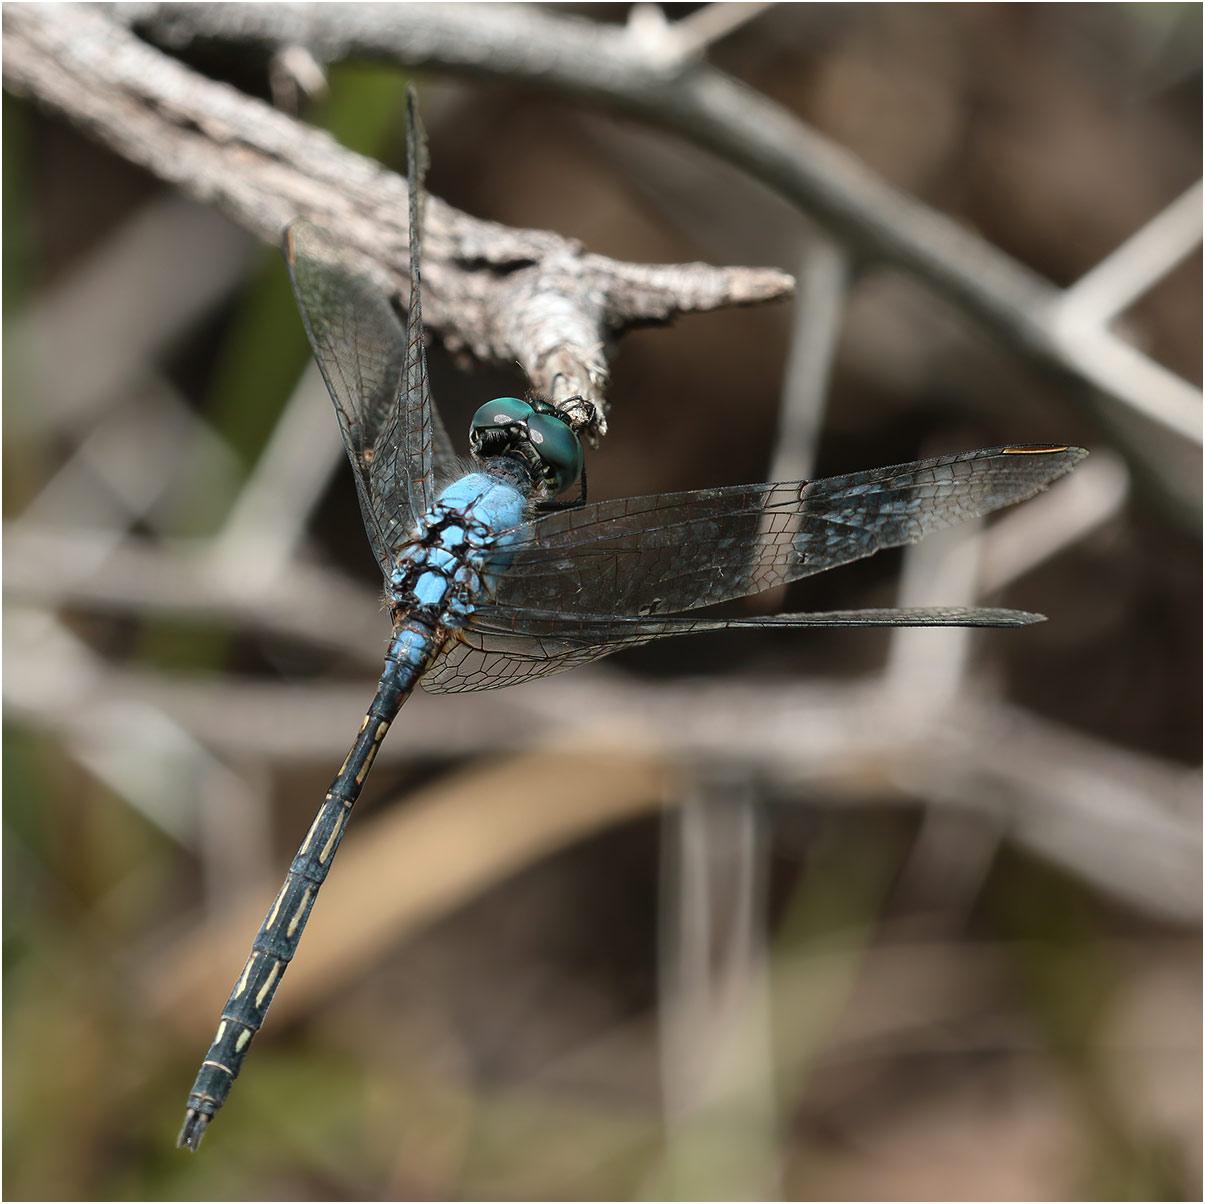 Trithemis stictica mâle, Namibie, Mayuni conservancy near Bum Hill, Kwando River, 16/02/2020